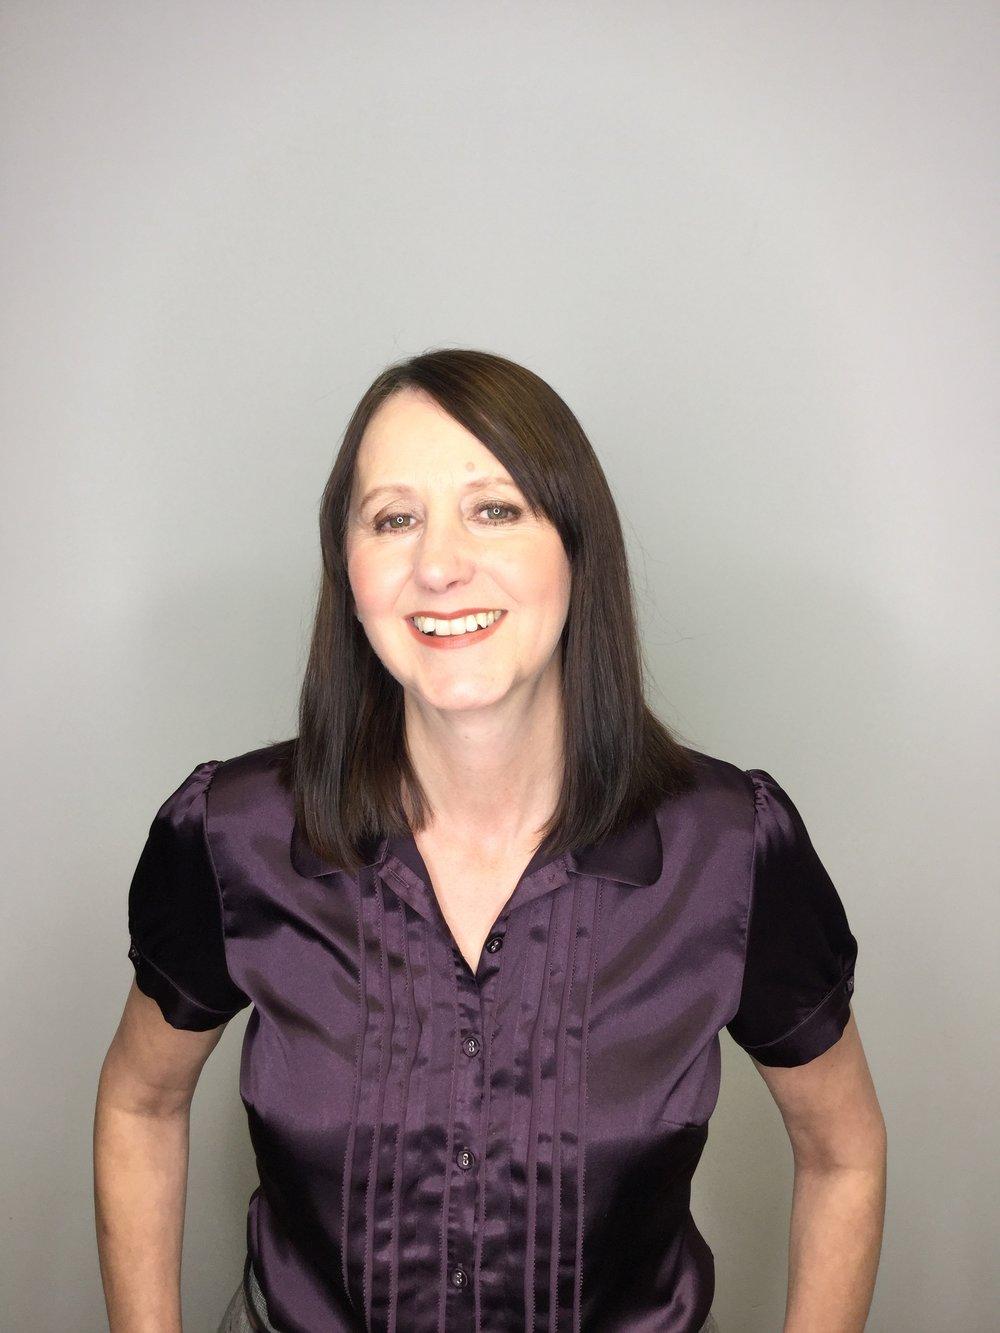 Janice Kershaw - Training C0-ordinator